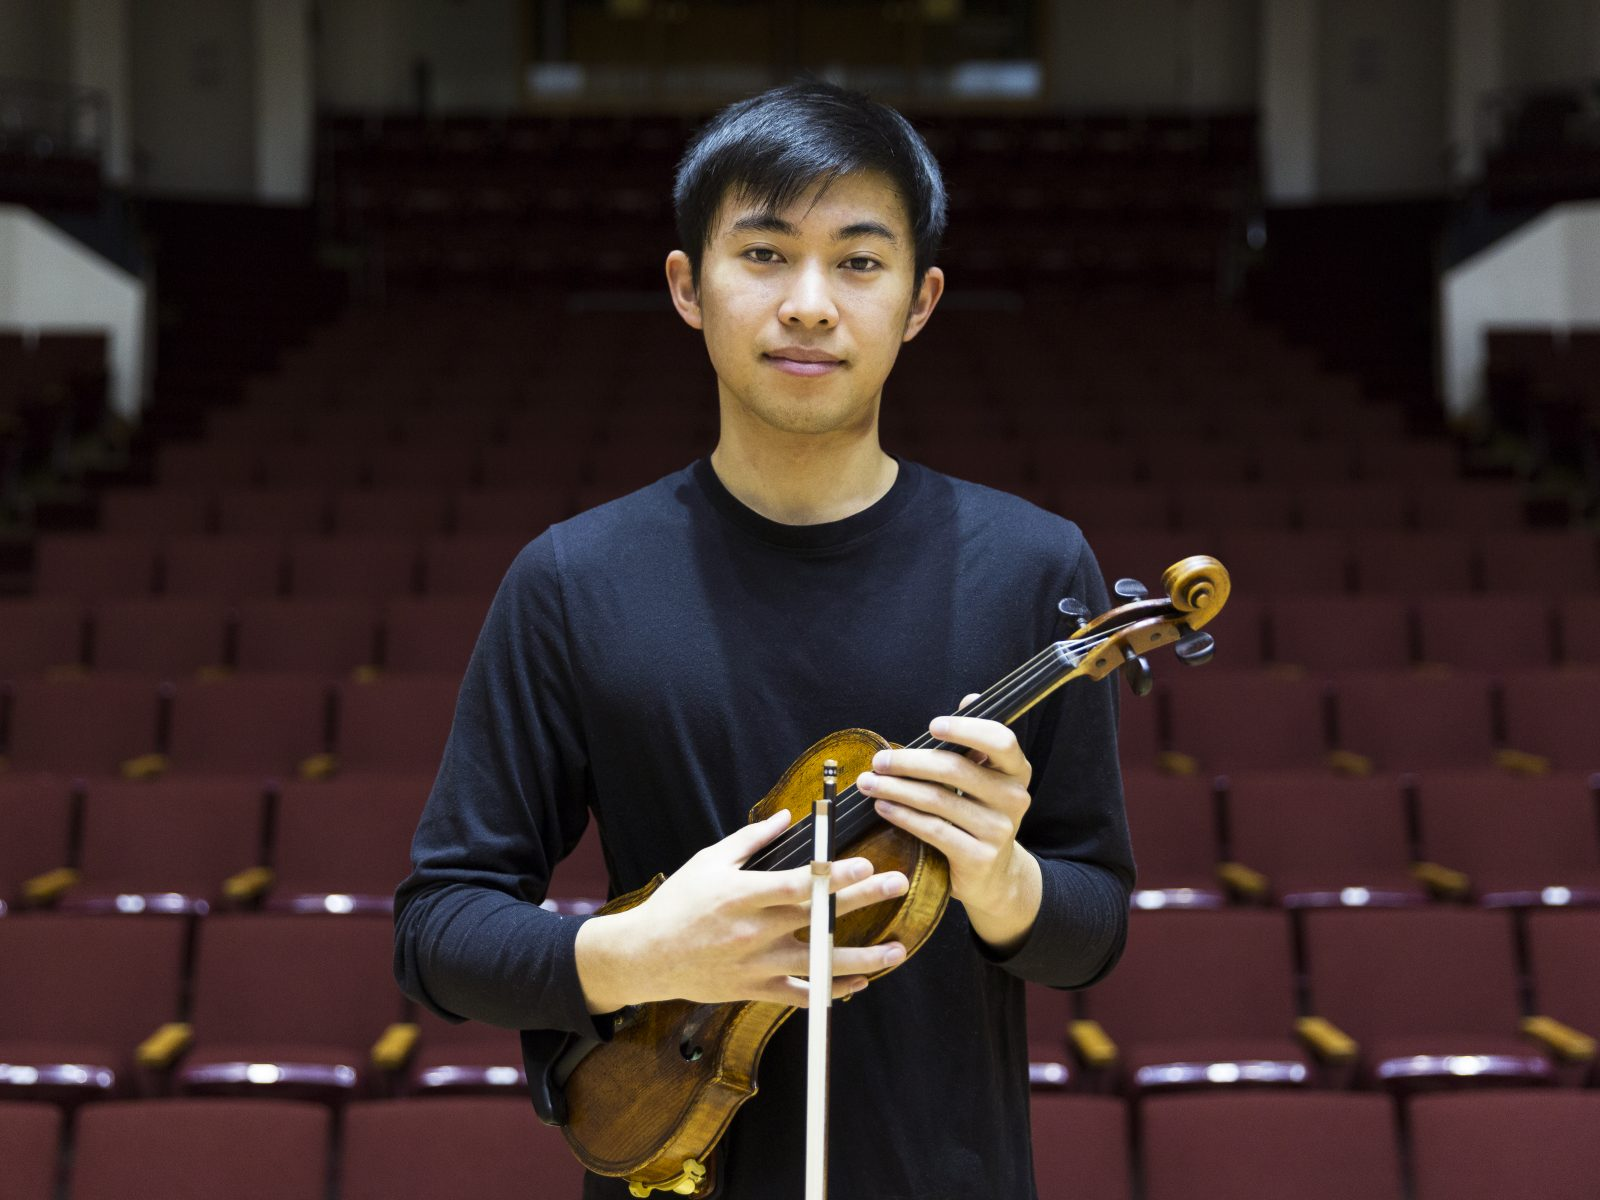 Luke Valmadrid poses with his violen